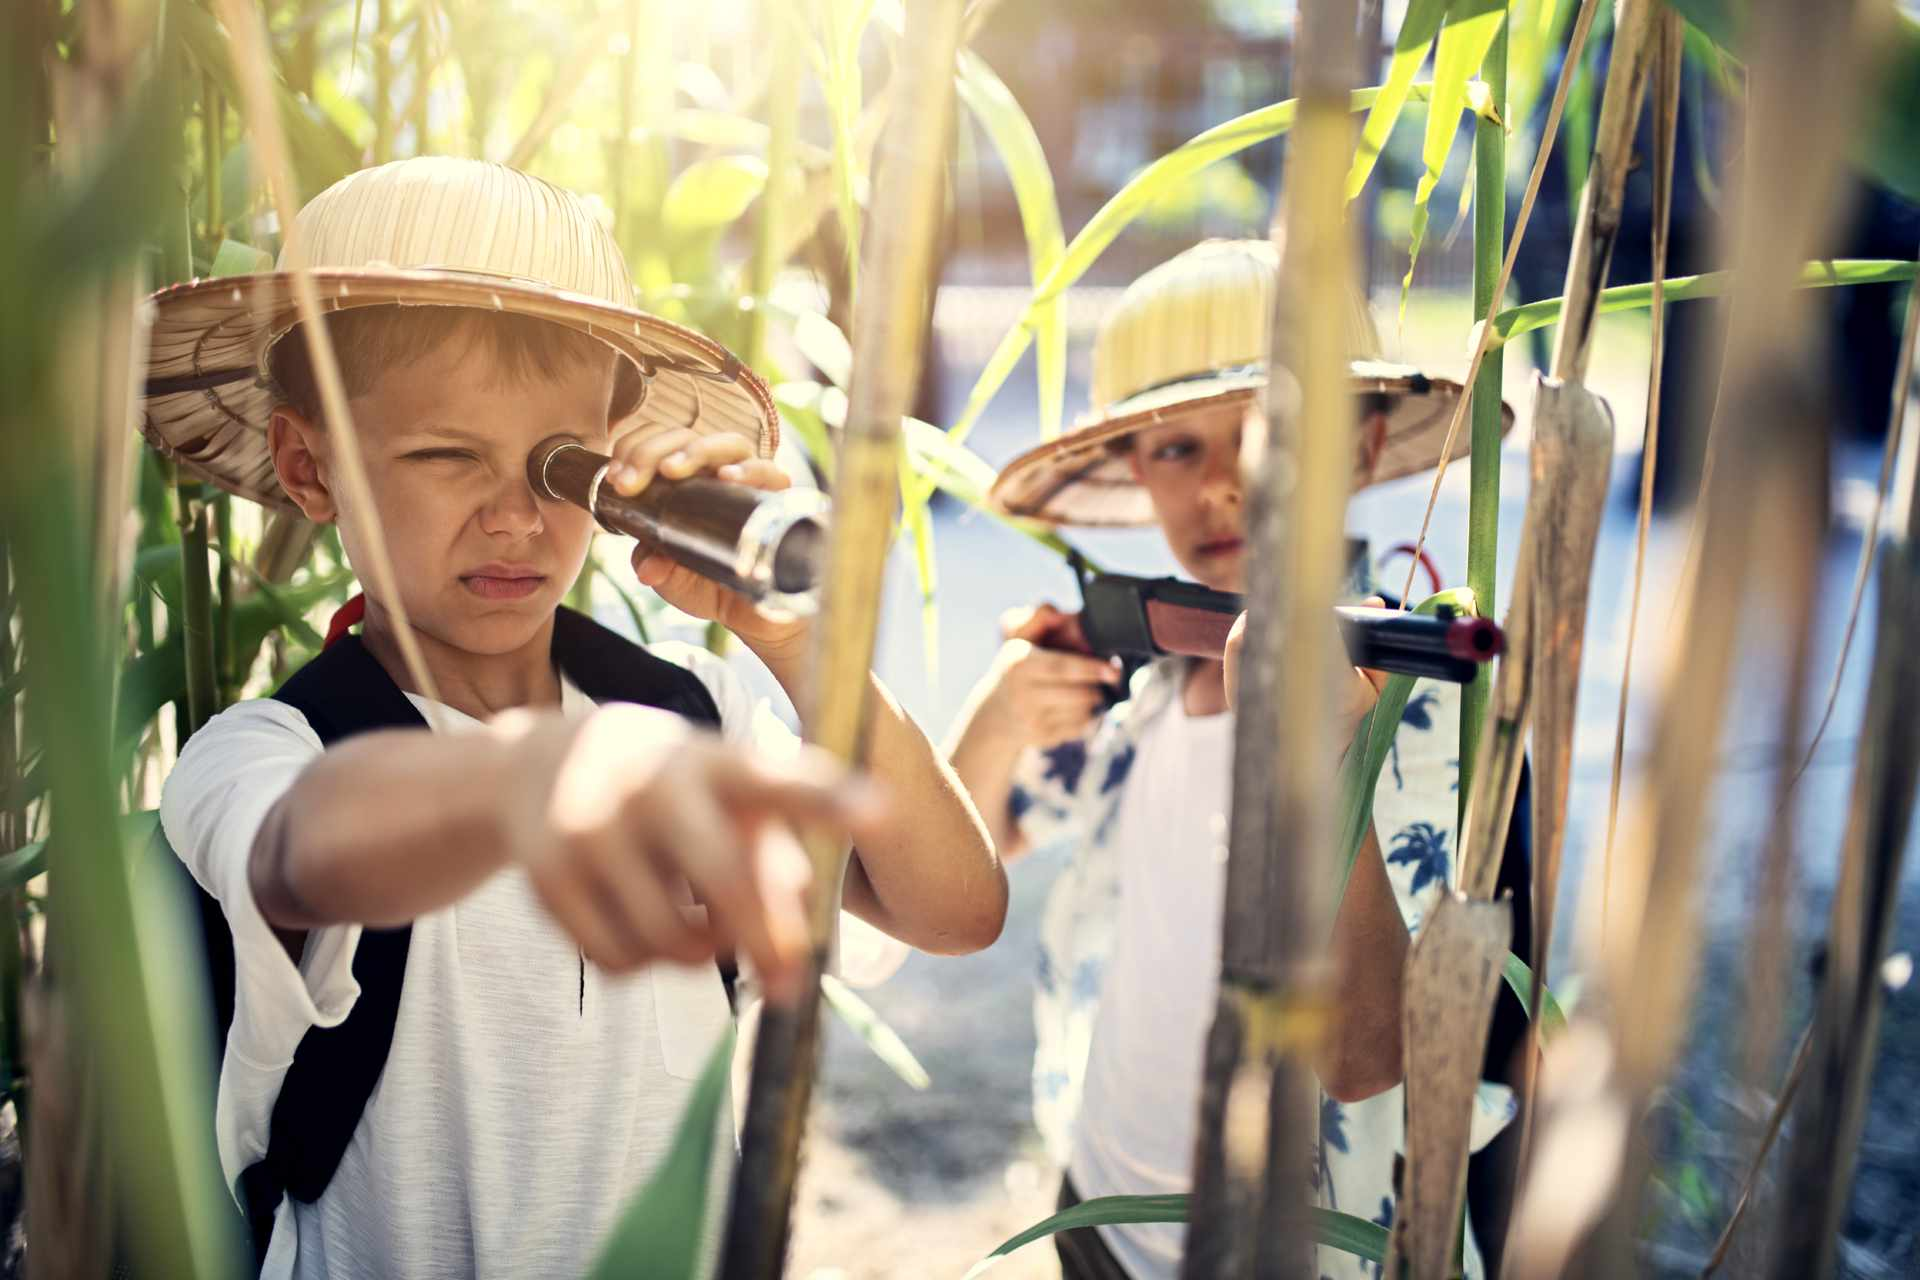 Two boys in jungle adventure gear.